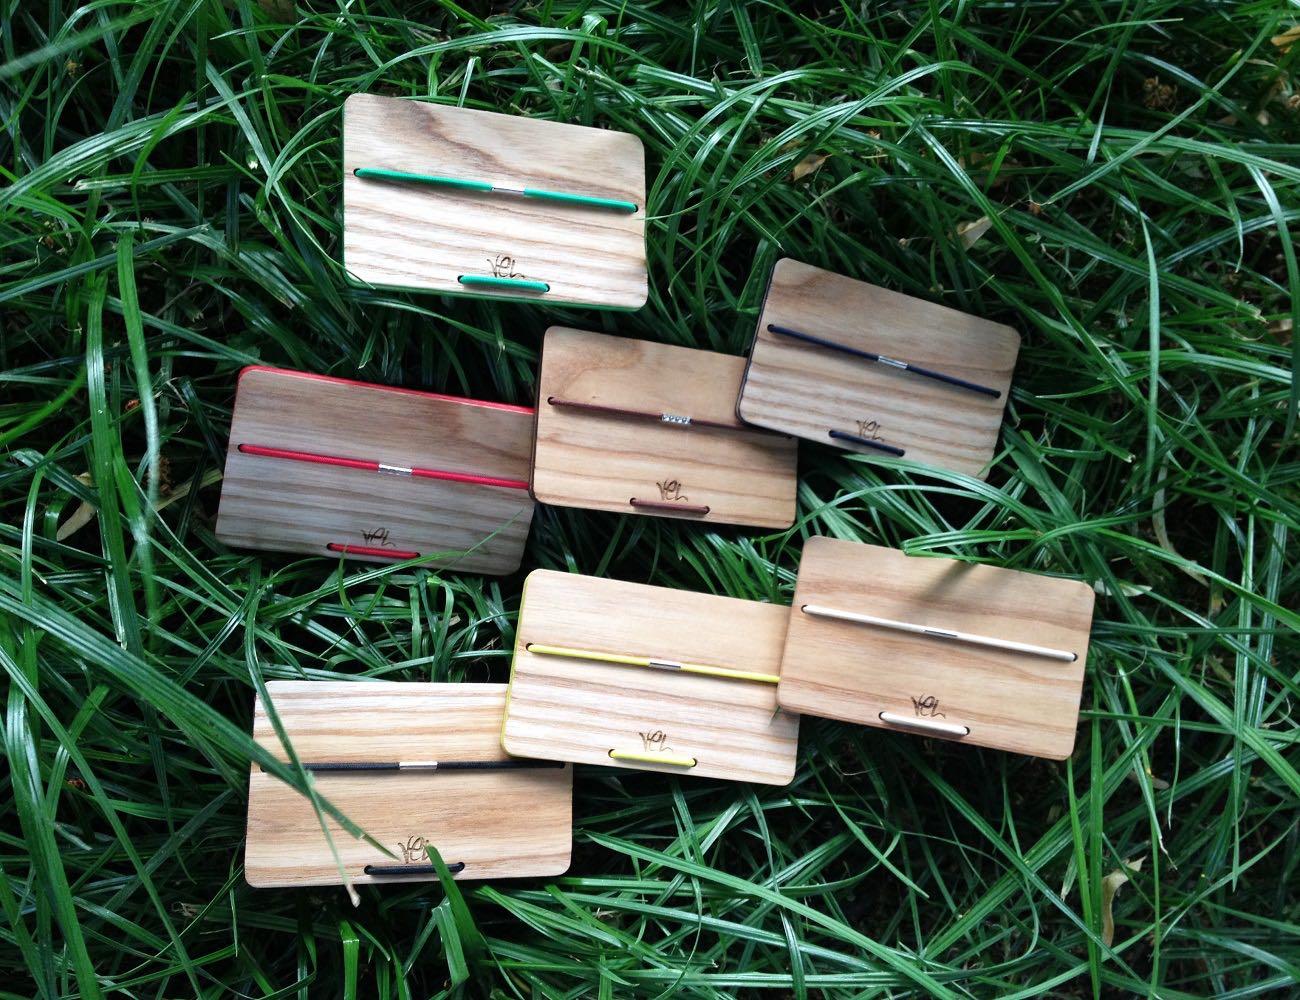 vel-stylish-wooden-cardholder-01